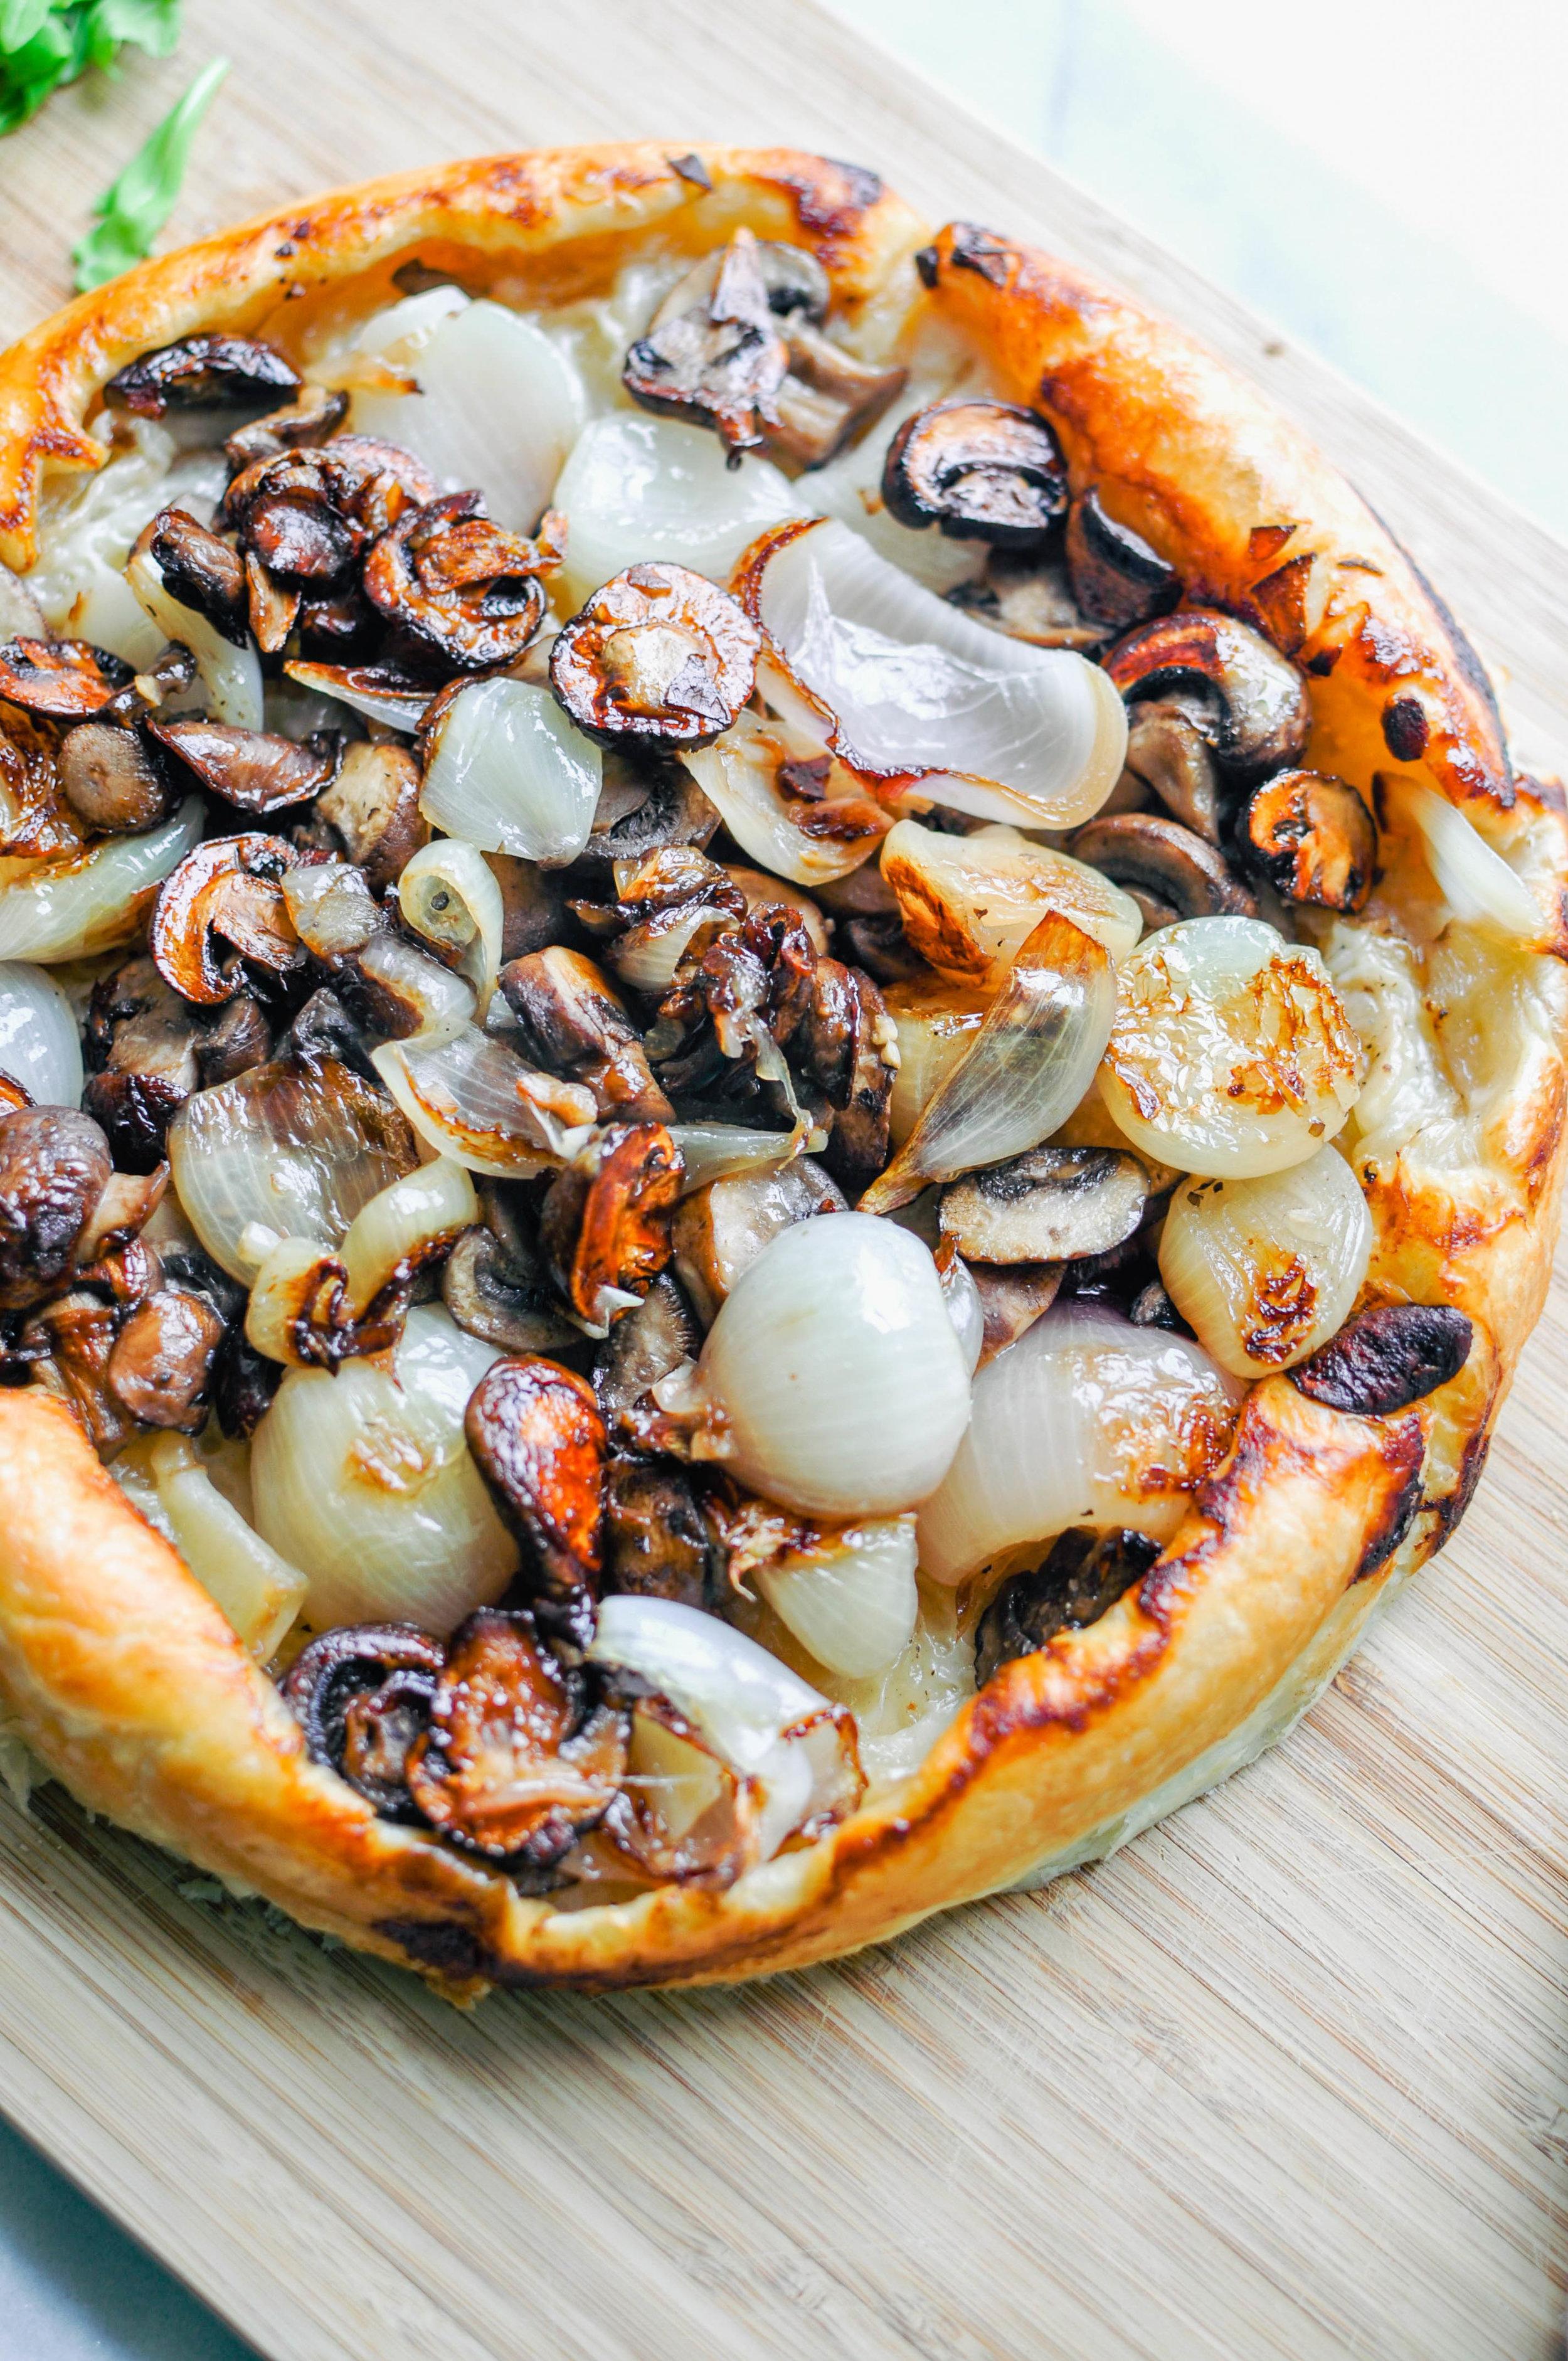 Shallot & Mushroom Tarte Tatin with Burrata | This Healthy Table